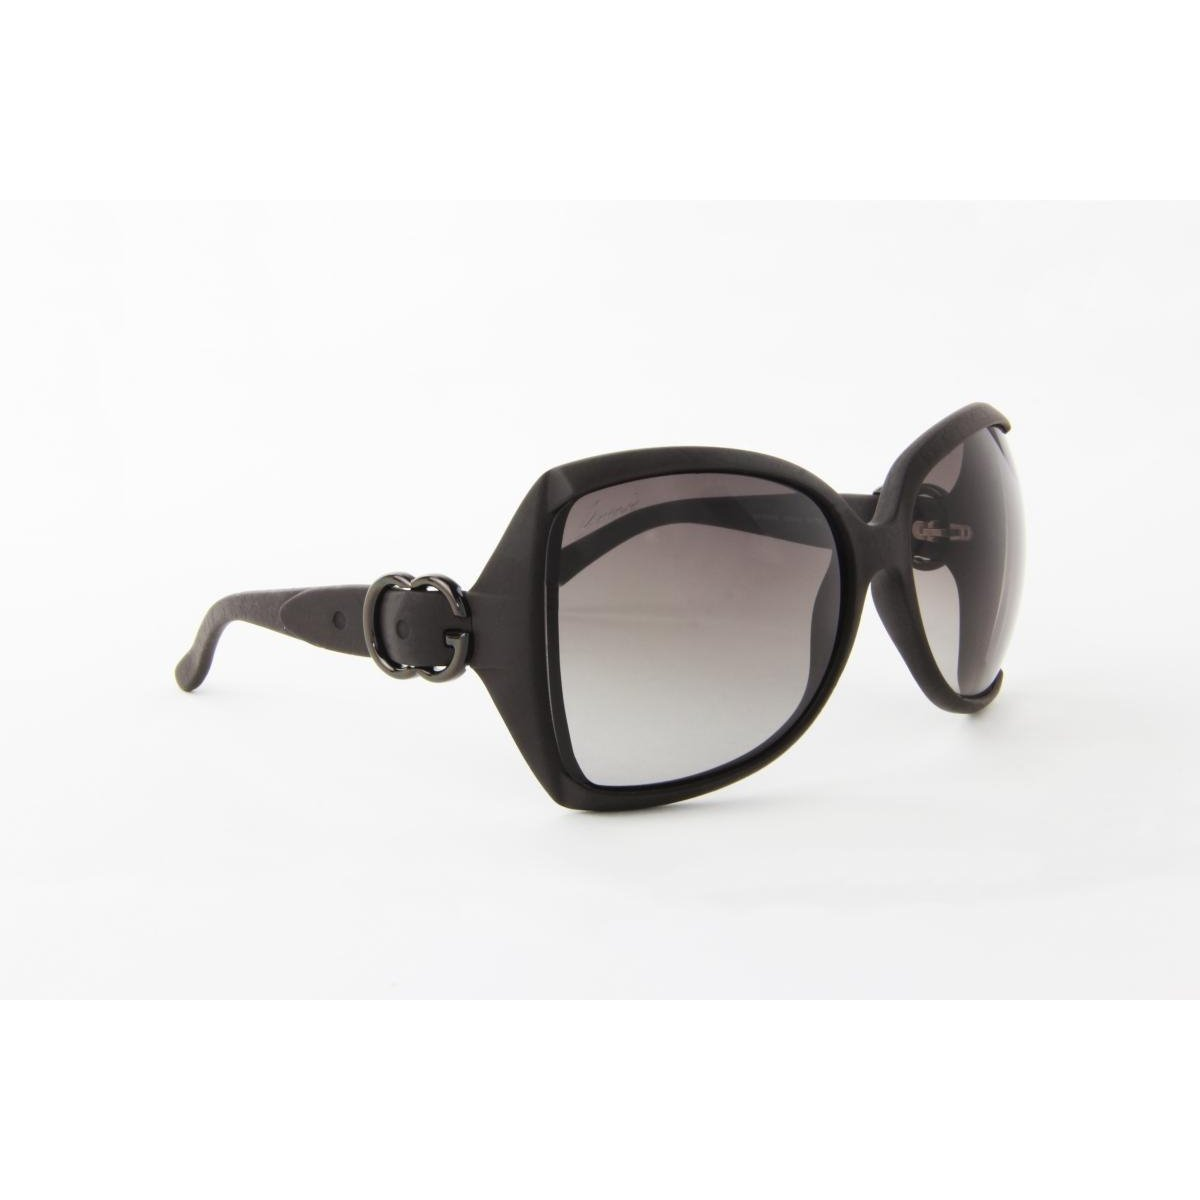 Óculos de Sol Gucci Acetato Lente Degradê - Compre Agora   Zattini d5899f18b6